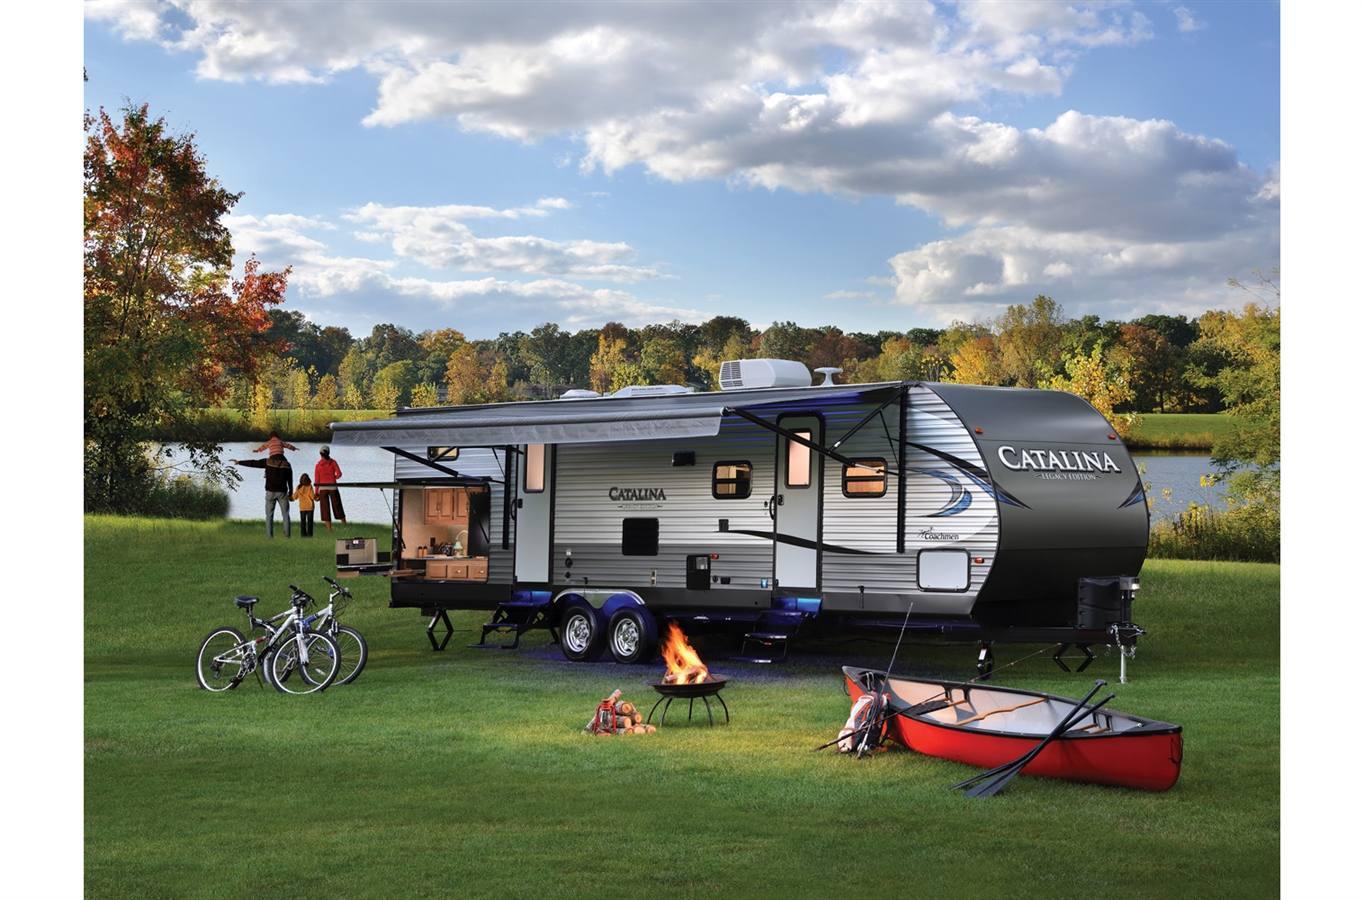 2018 Catalina by Coachmen 283RKS for sale in Deer Park, WA  Parkway